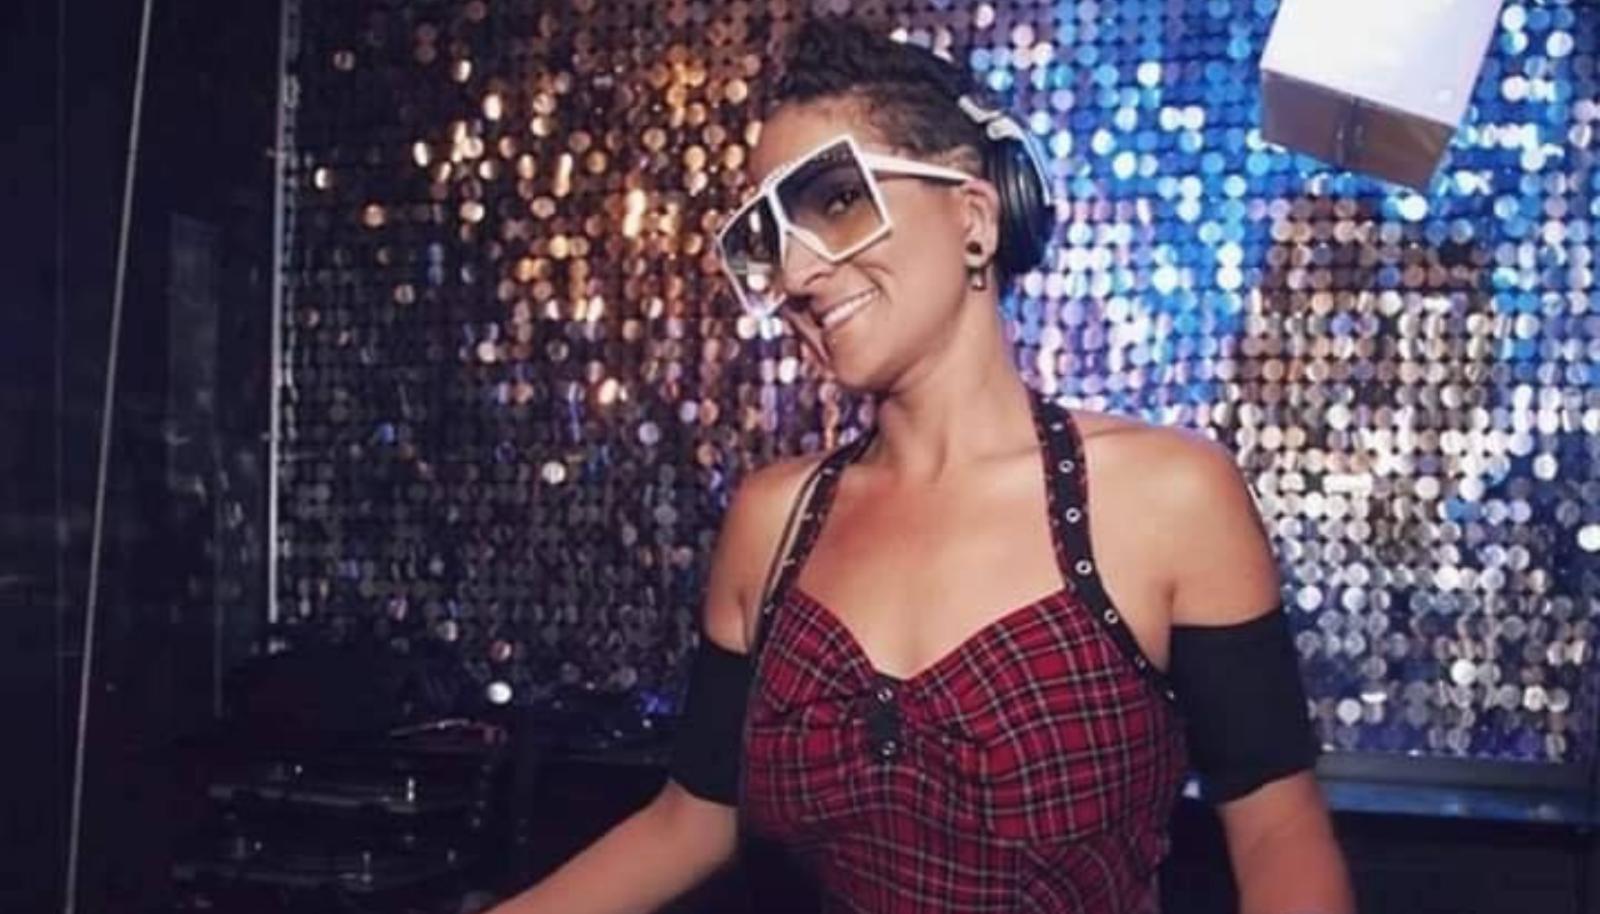 DJ Spitfire - Resident DJ on The DJ Sessions